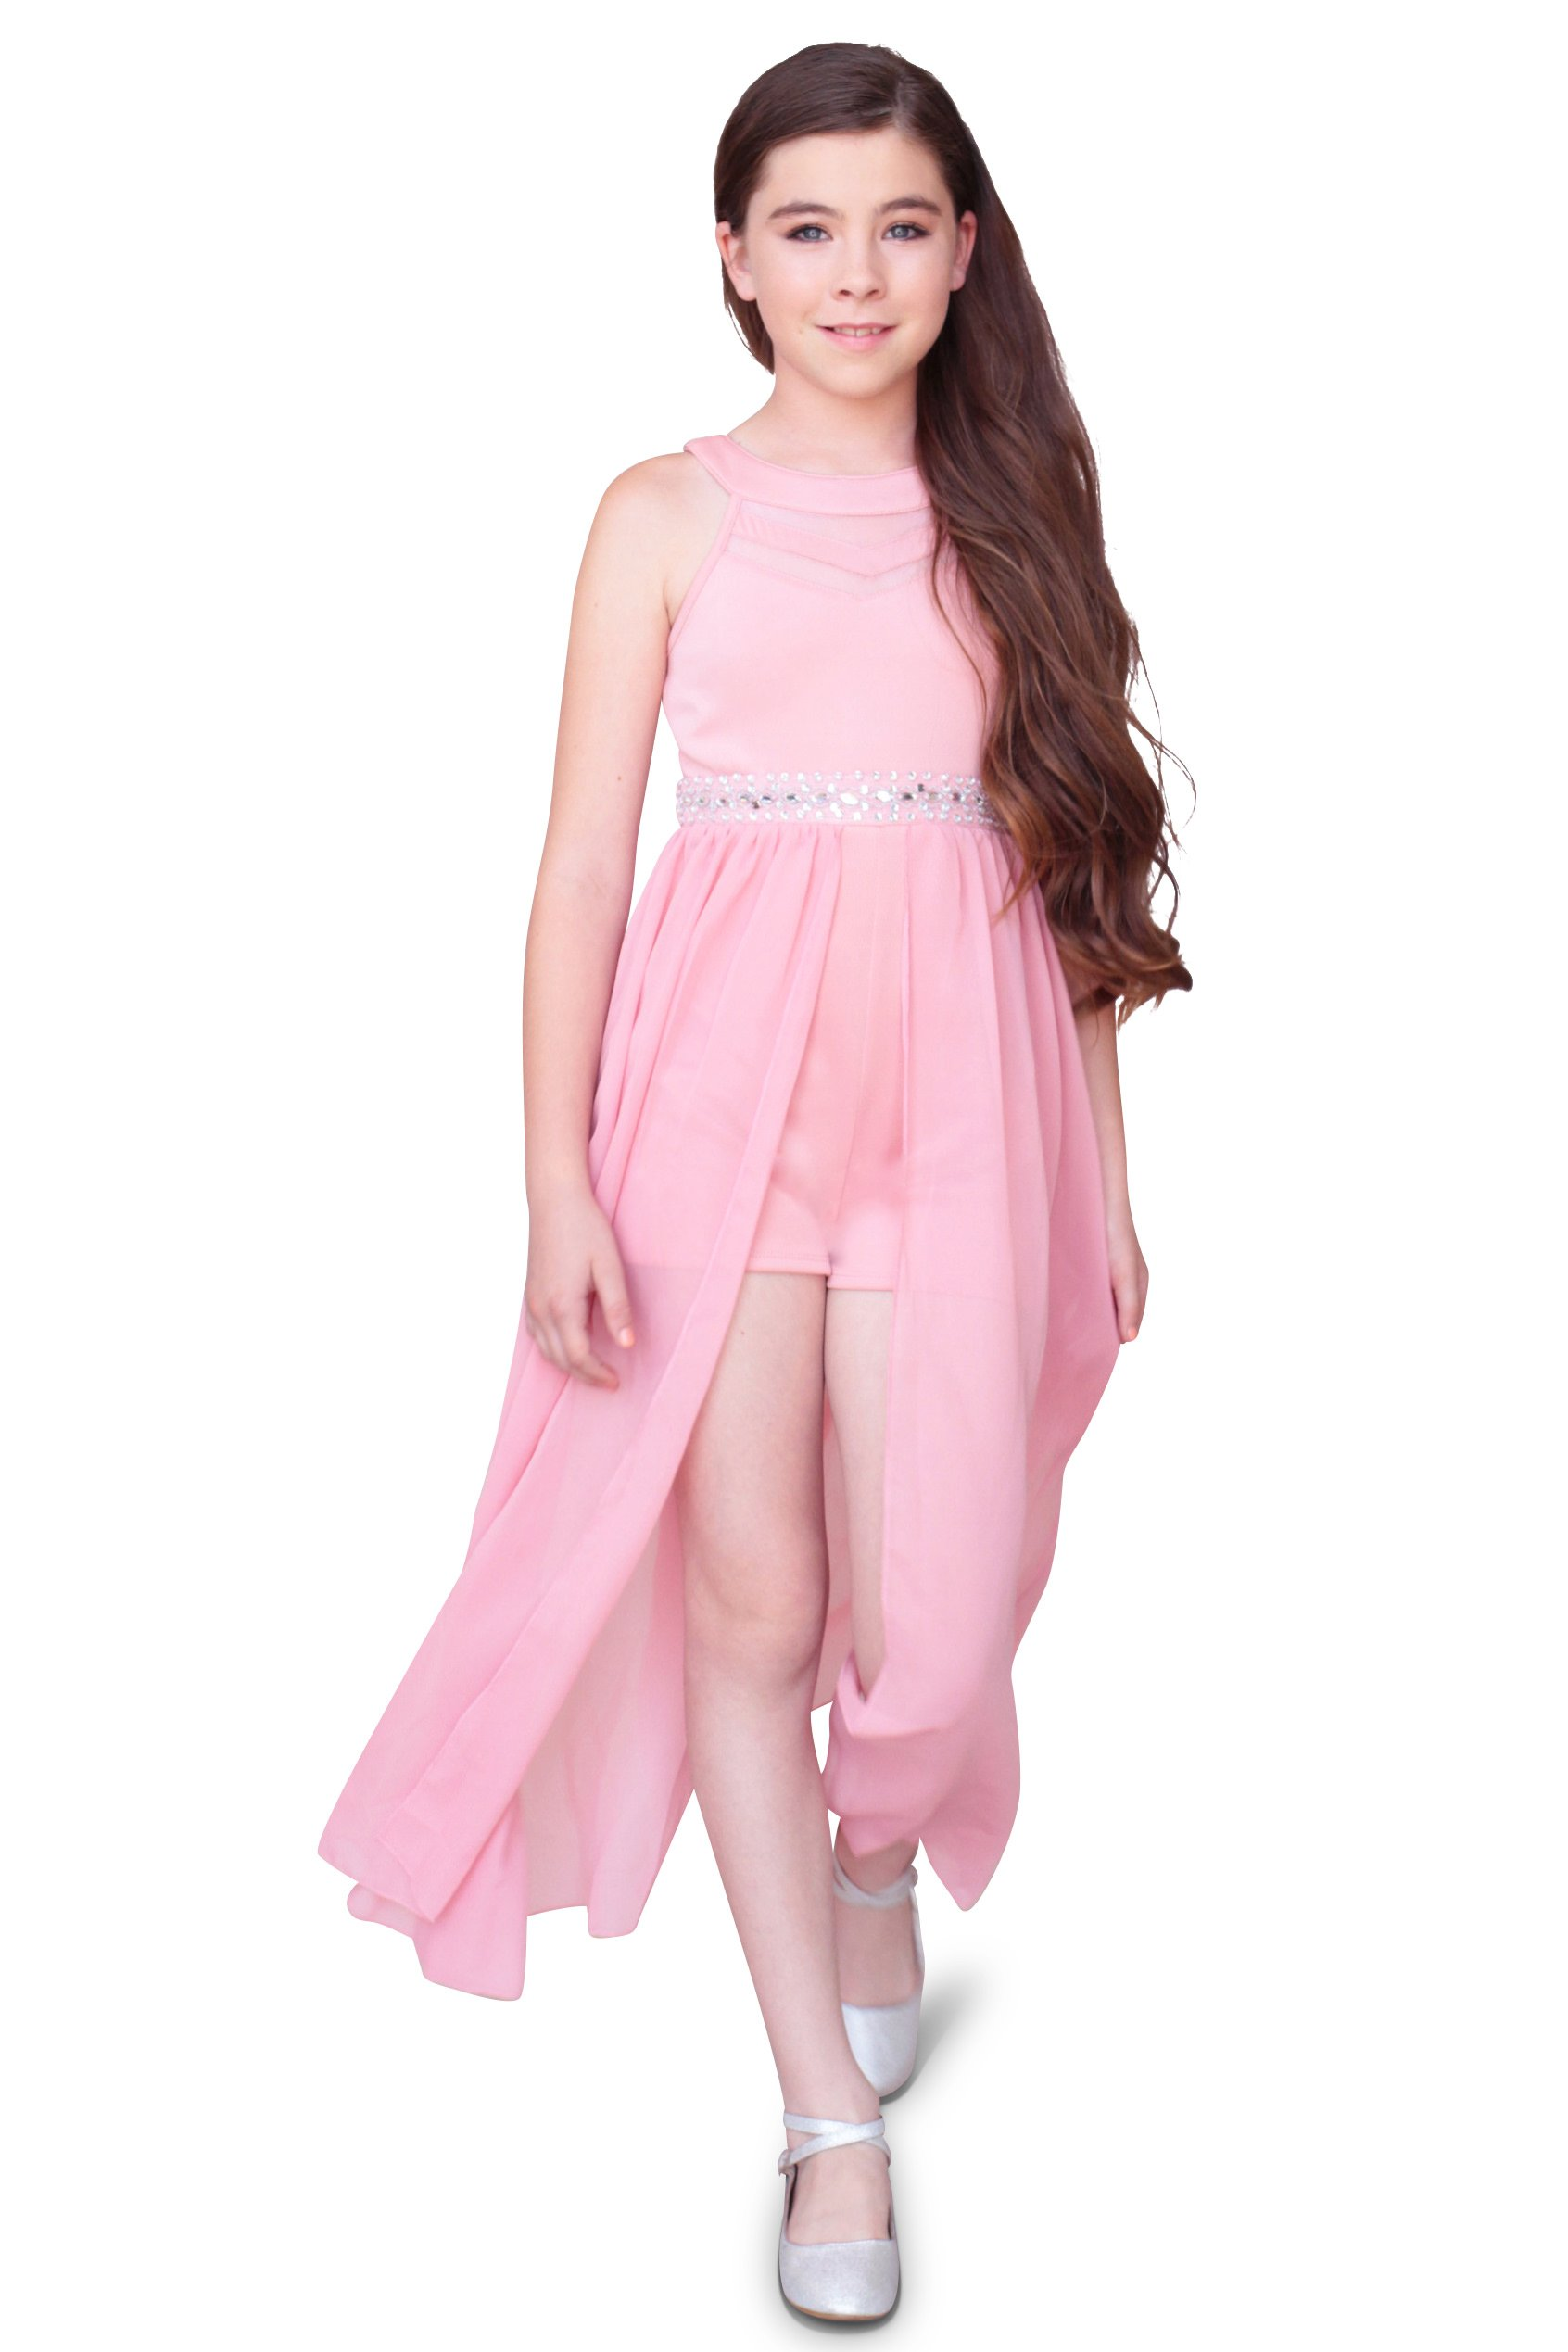 Emerald Sundae Girls Illusion Halter Maxi Romper Dress, Pink, Size 14